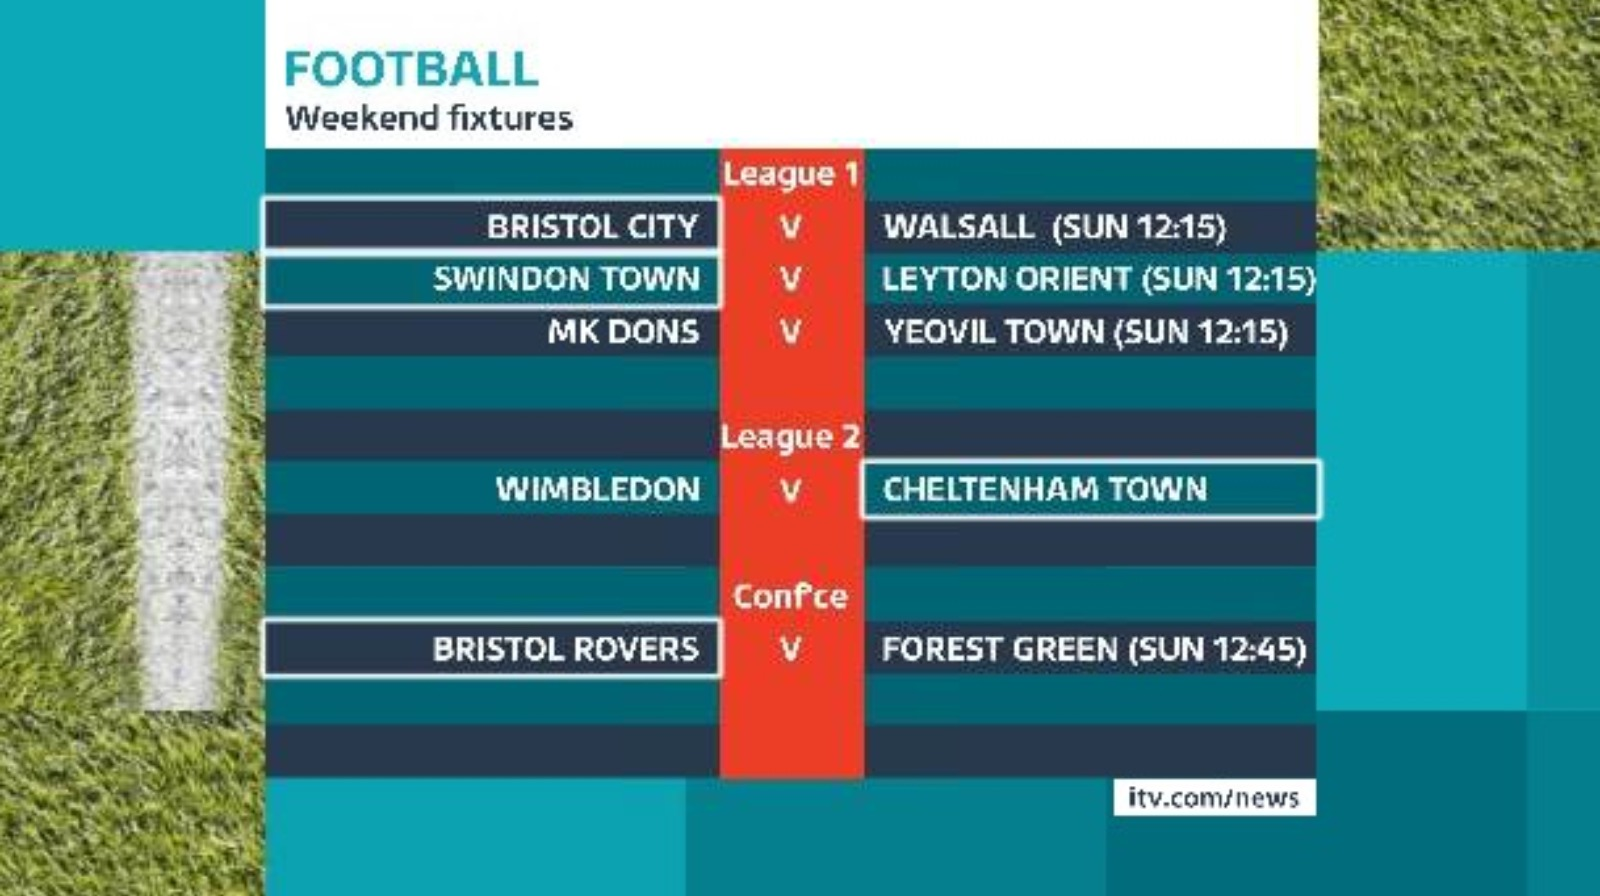 Weekend football coupon predictions